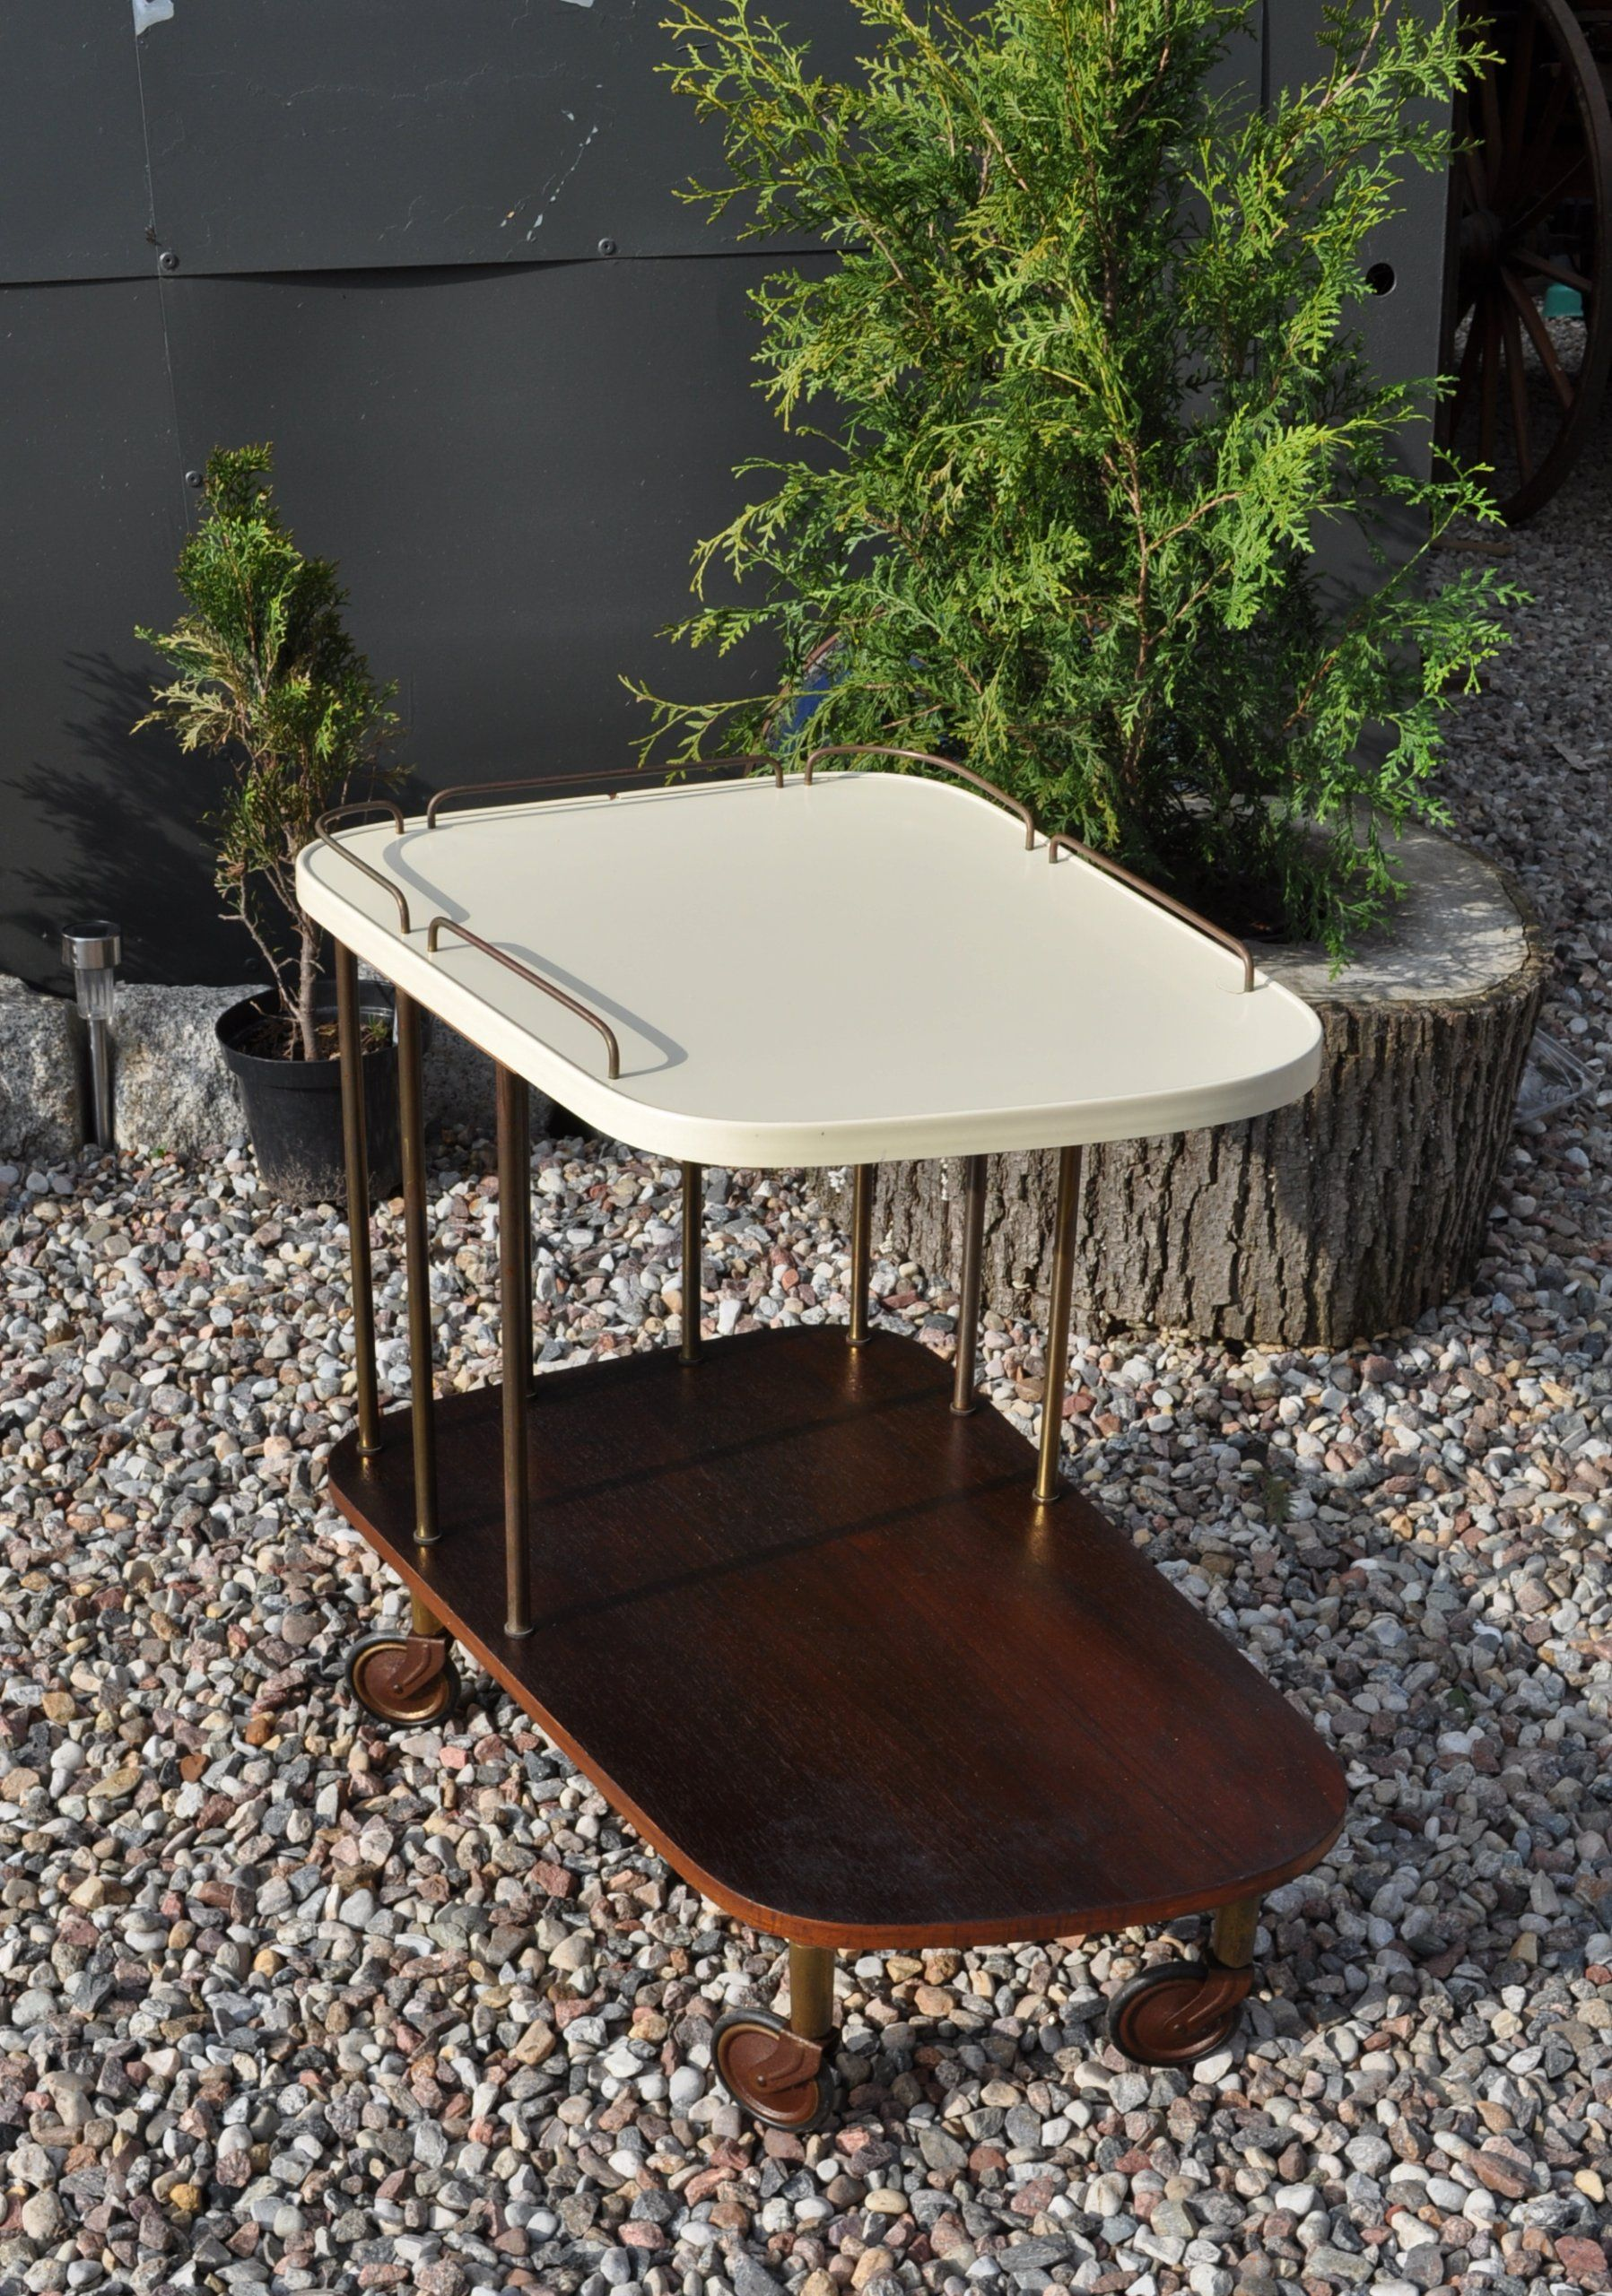 Stolik Barek Na Kolkach Do Serwowania Vintage 7299938832 Oficjalne Archiwum Allegro Coffee Table Home Decor Decor